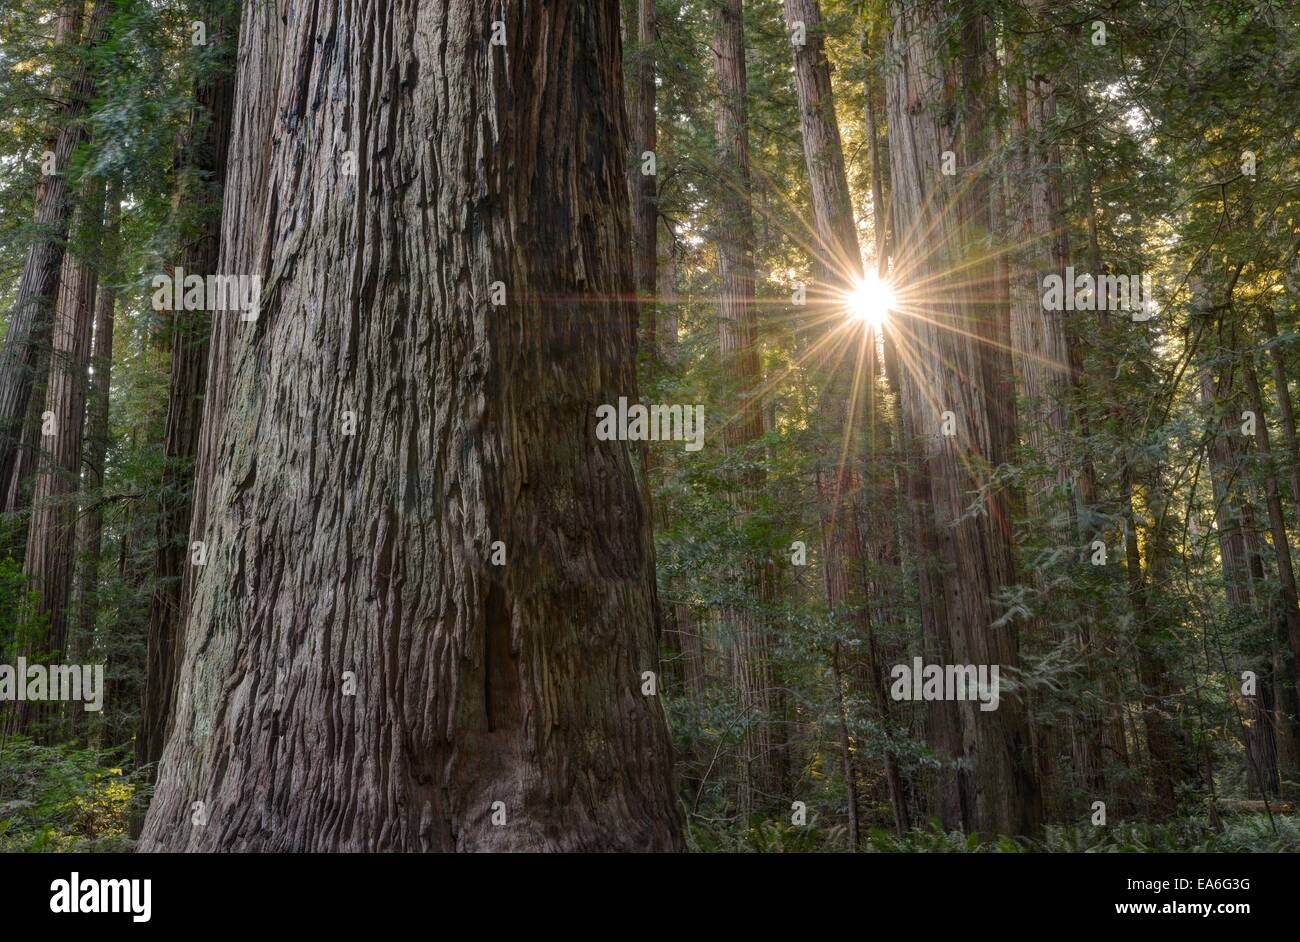 USA, California, Redwood National Park, Sunburst Through Redwood Trees in Stout Grove - Stock Image